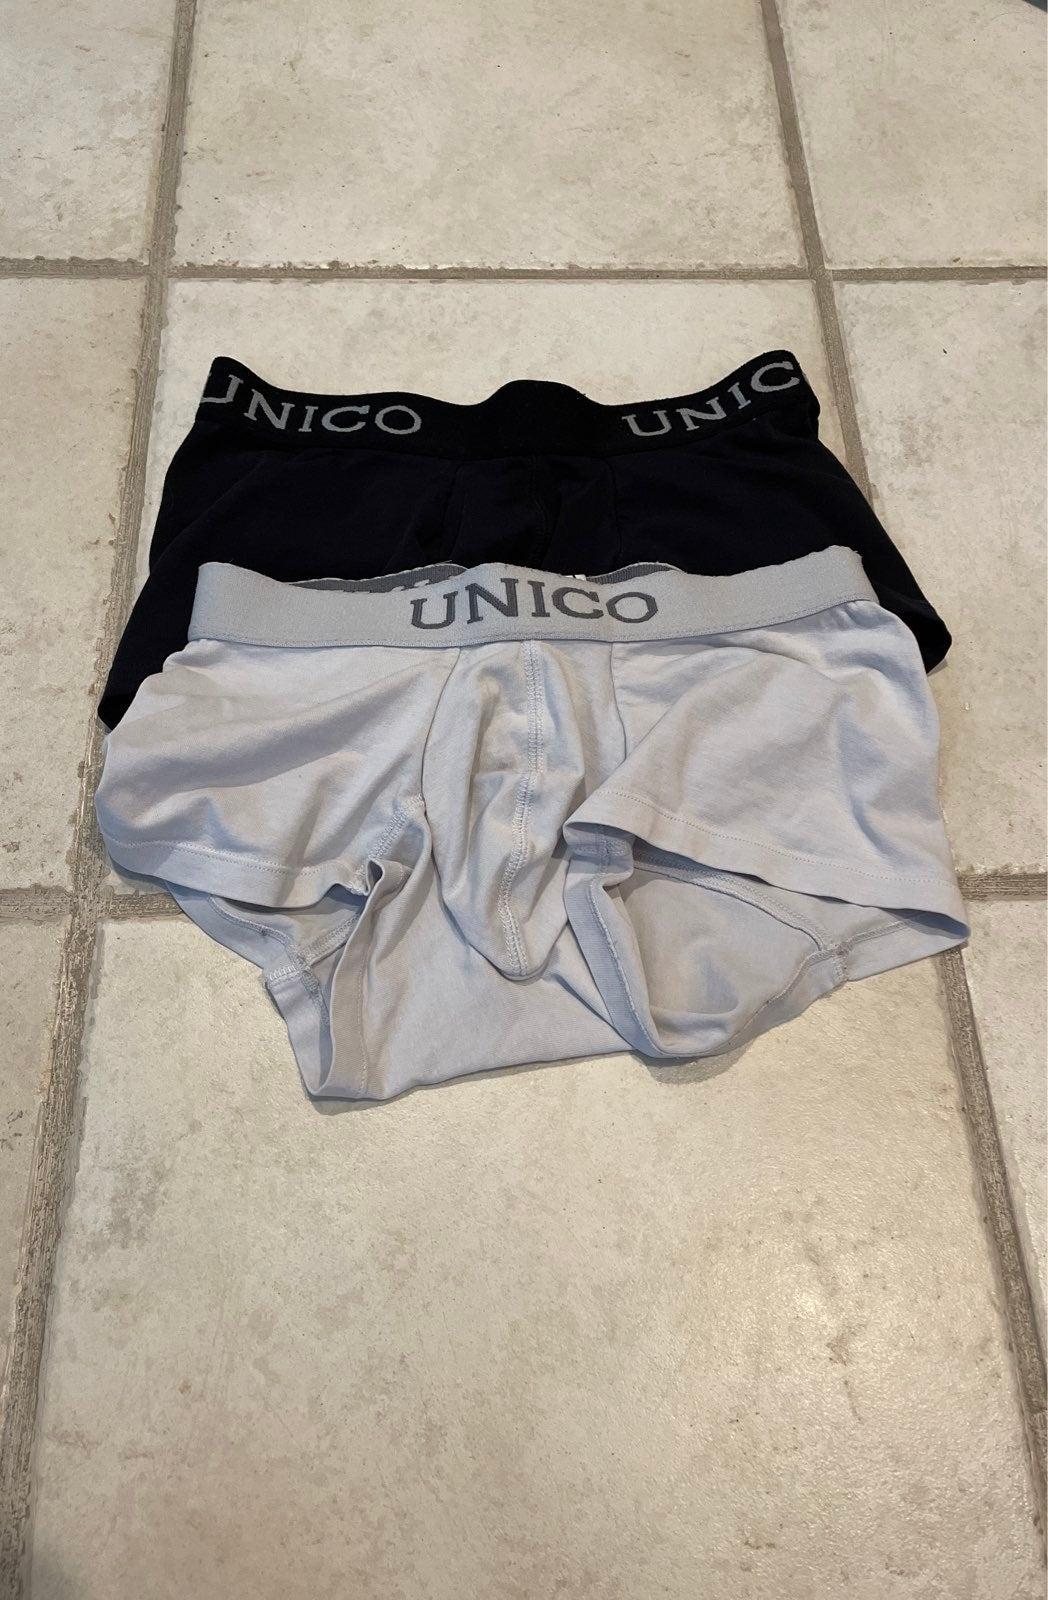 Unico Trunks